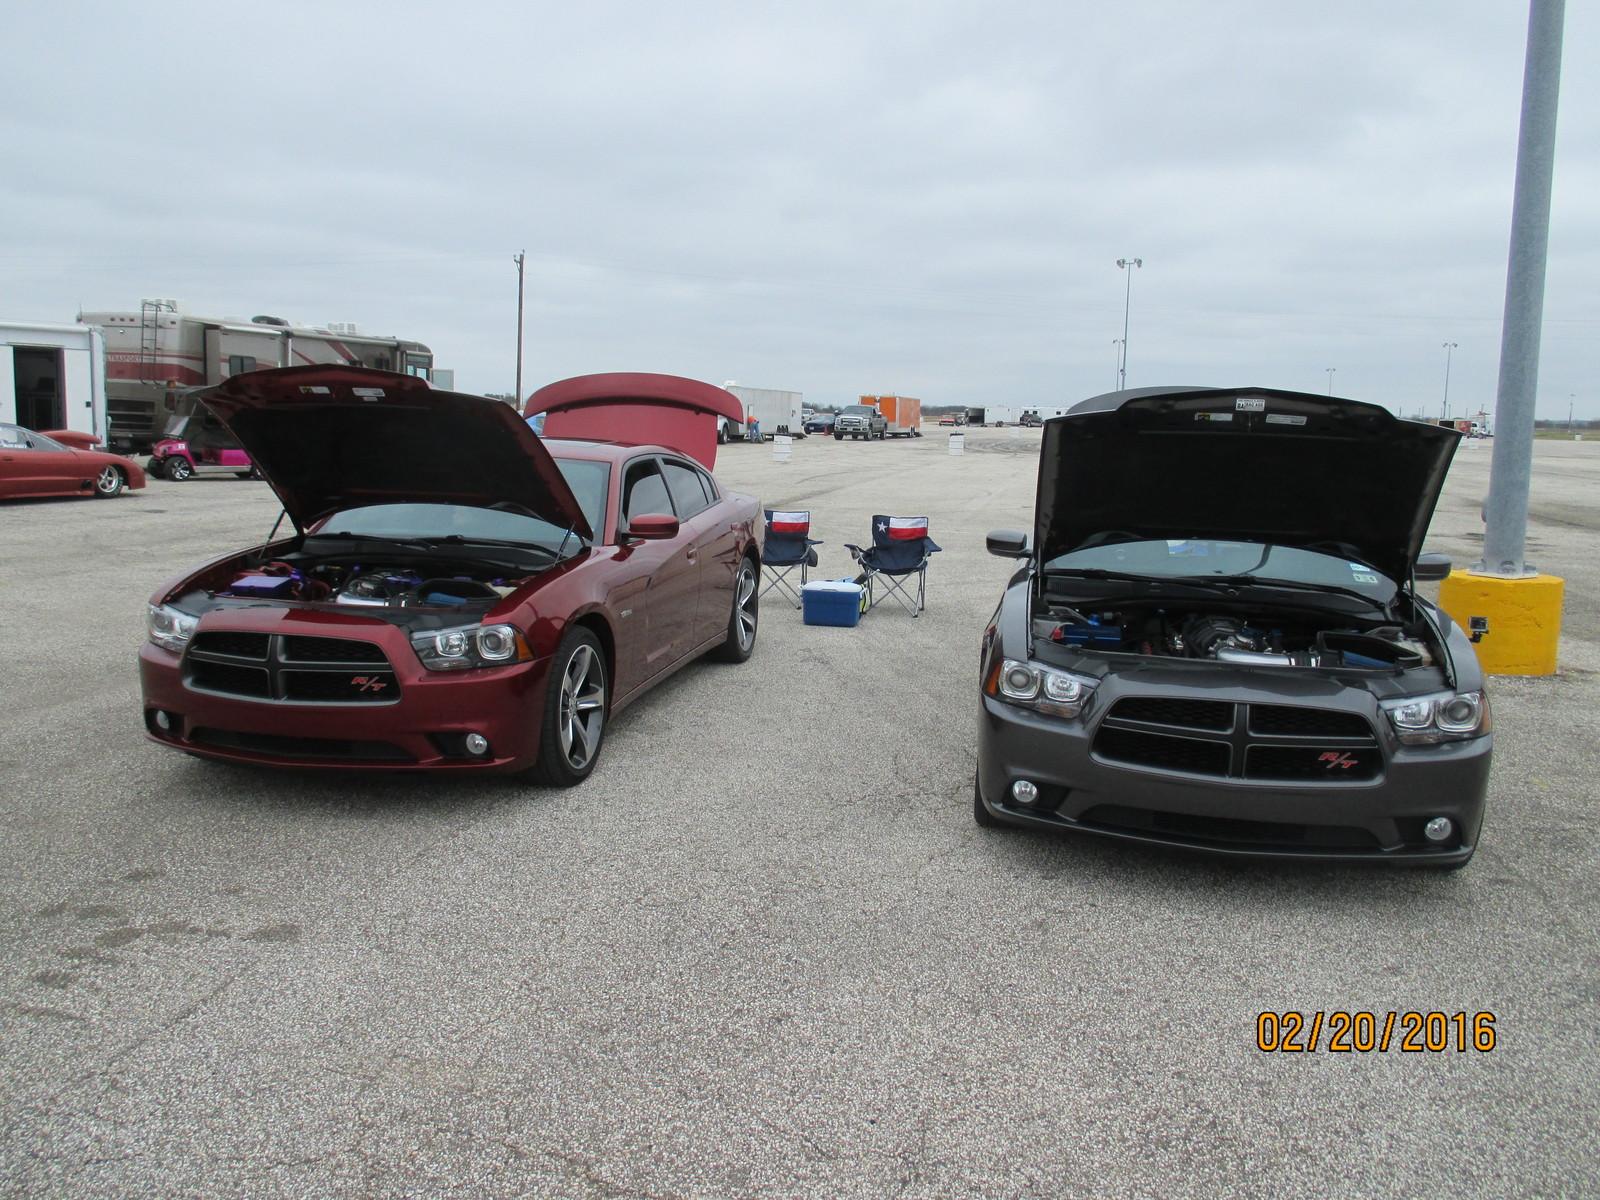 2014 Dodge Charger R T 1 4 Mile Drag Racing Timeslip Specs 0 60 Dragtimes Com